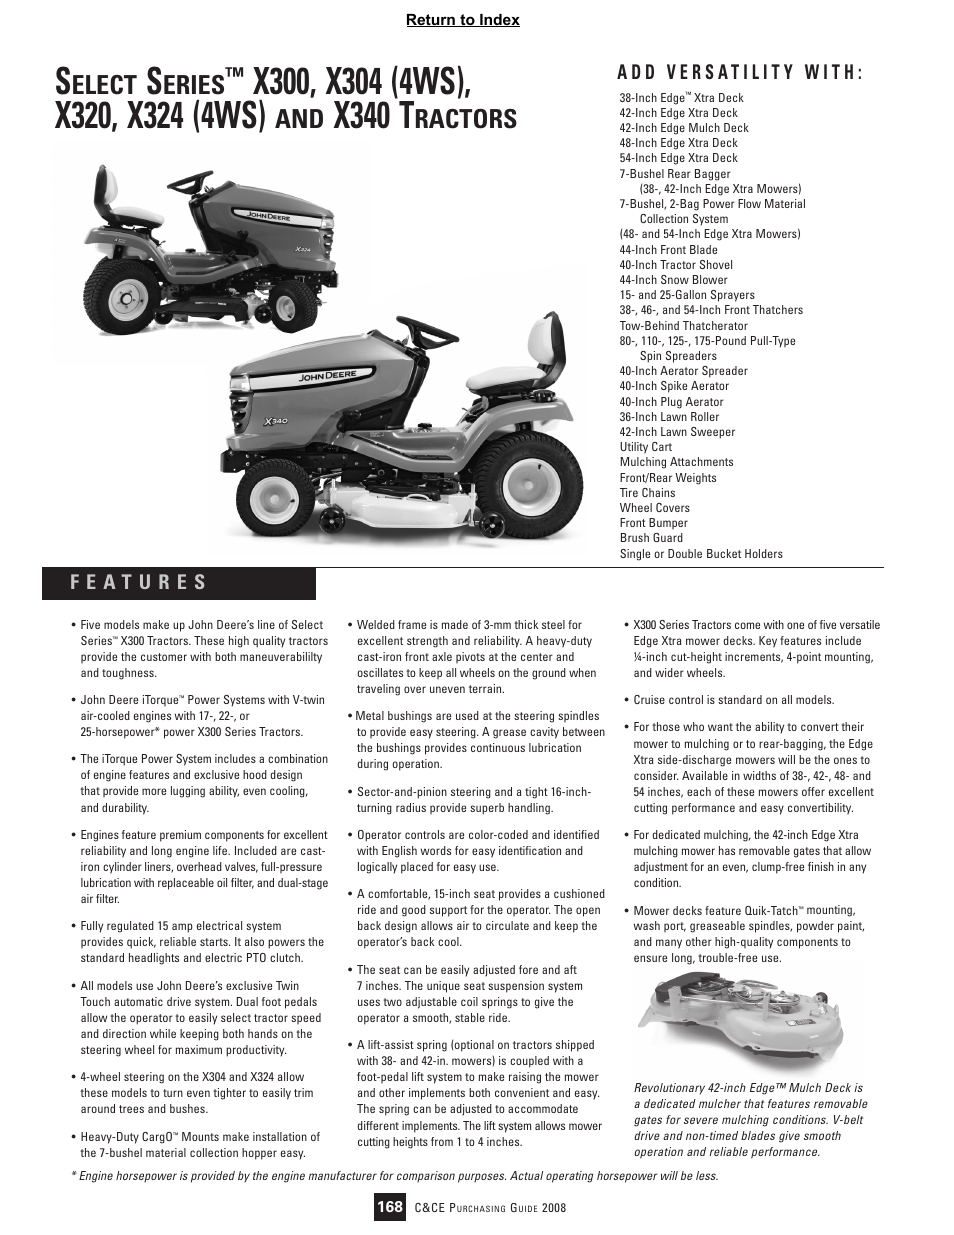 manual x324